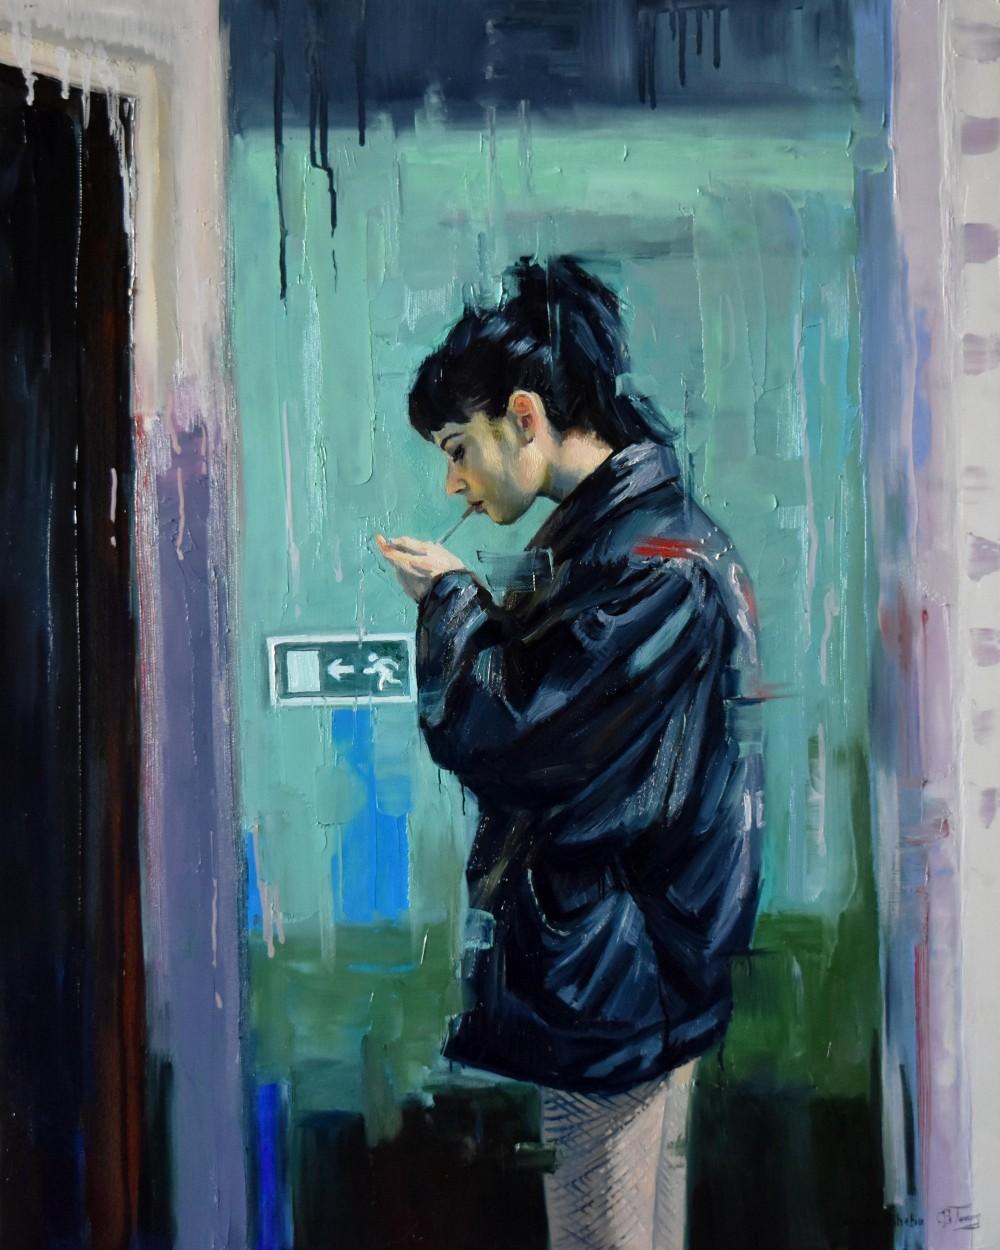 A cigarette for a good start